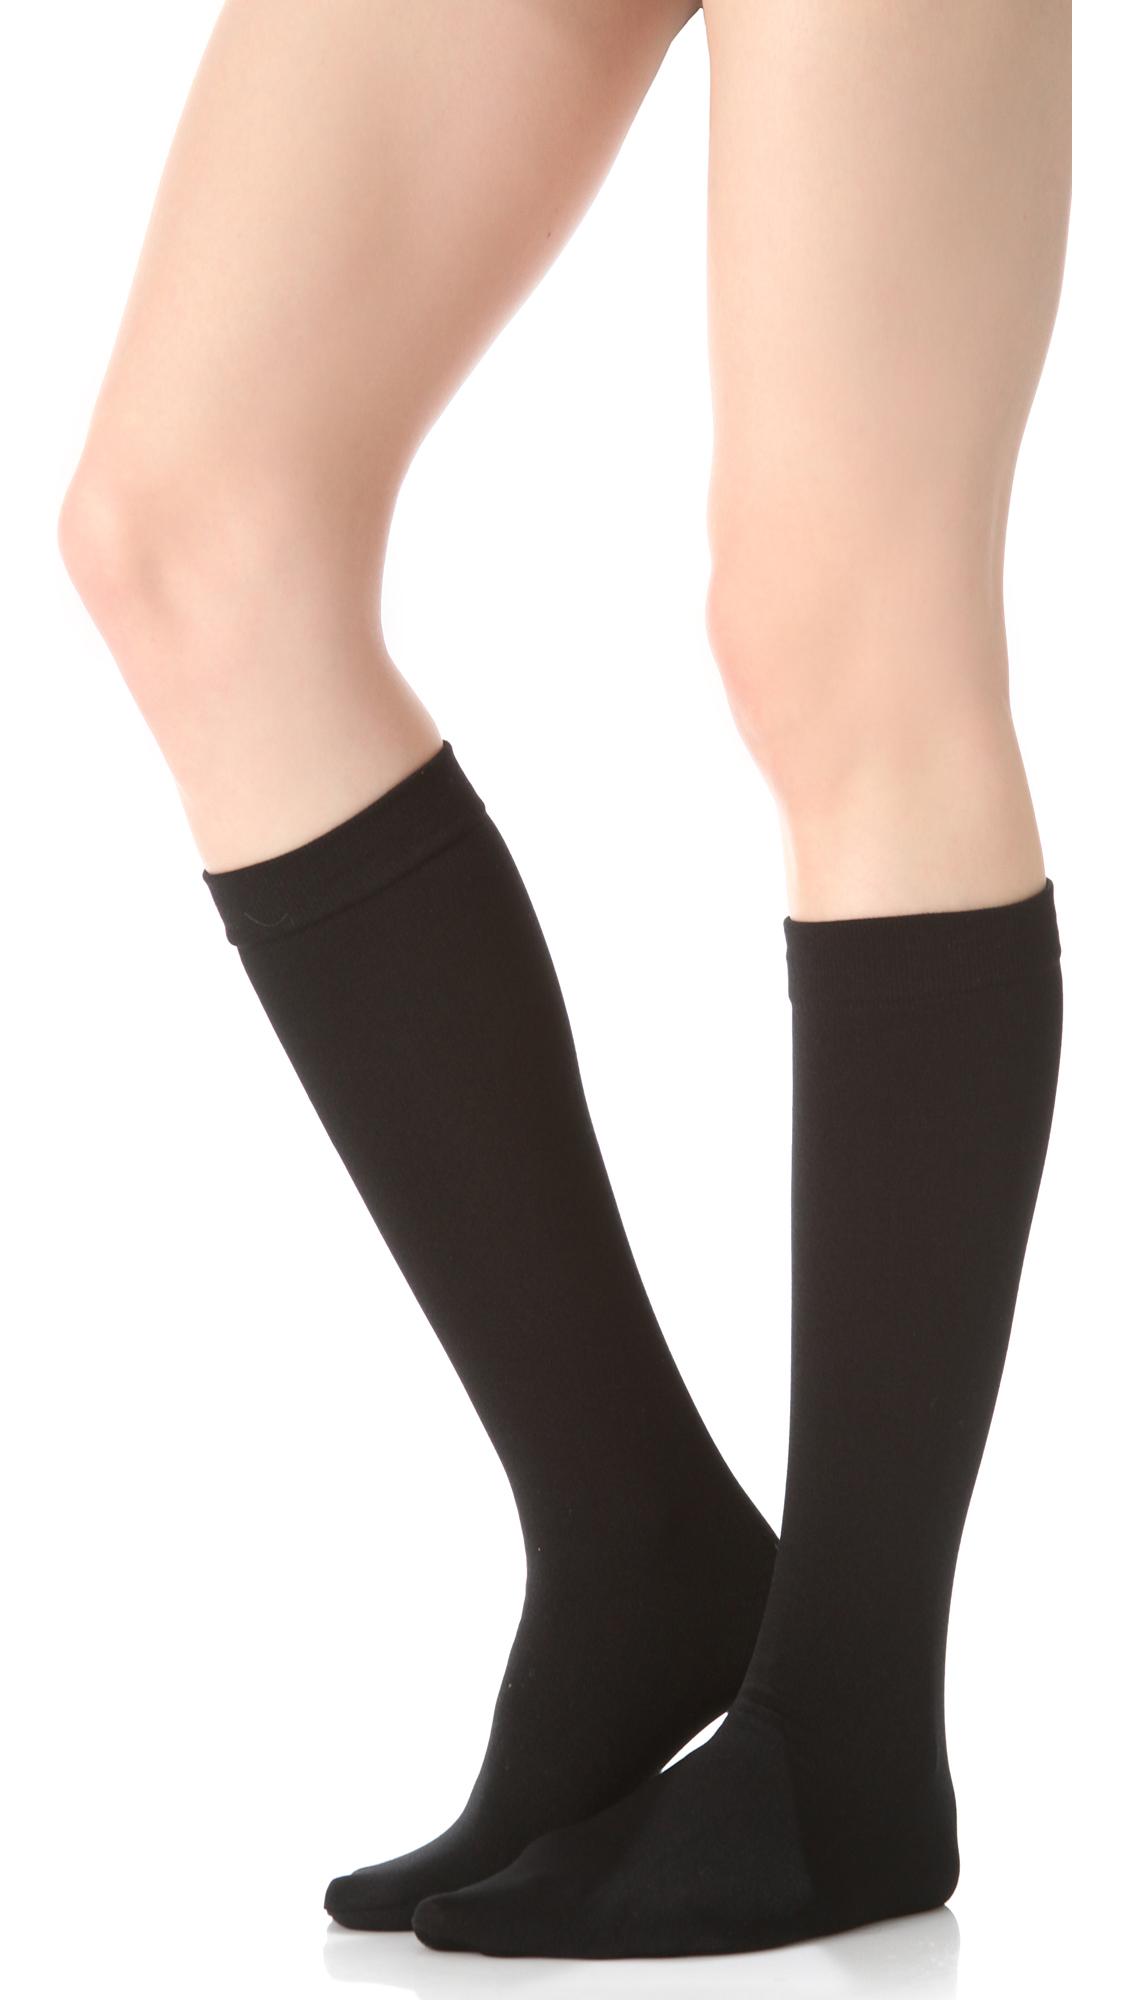 91dde26aa18 Plush Fleece Lined Knee High Socks